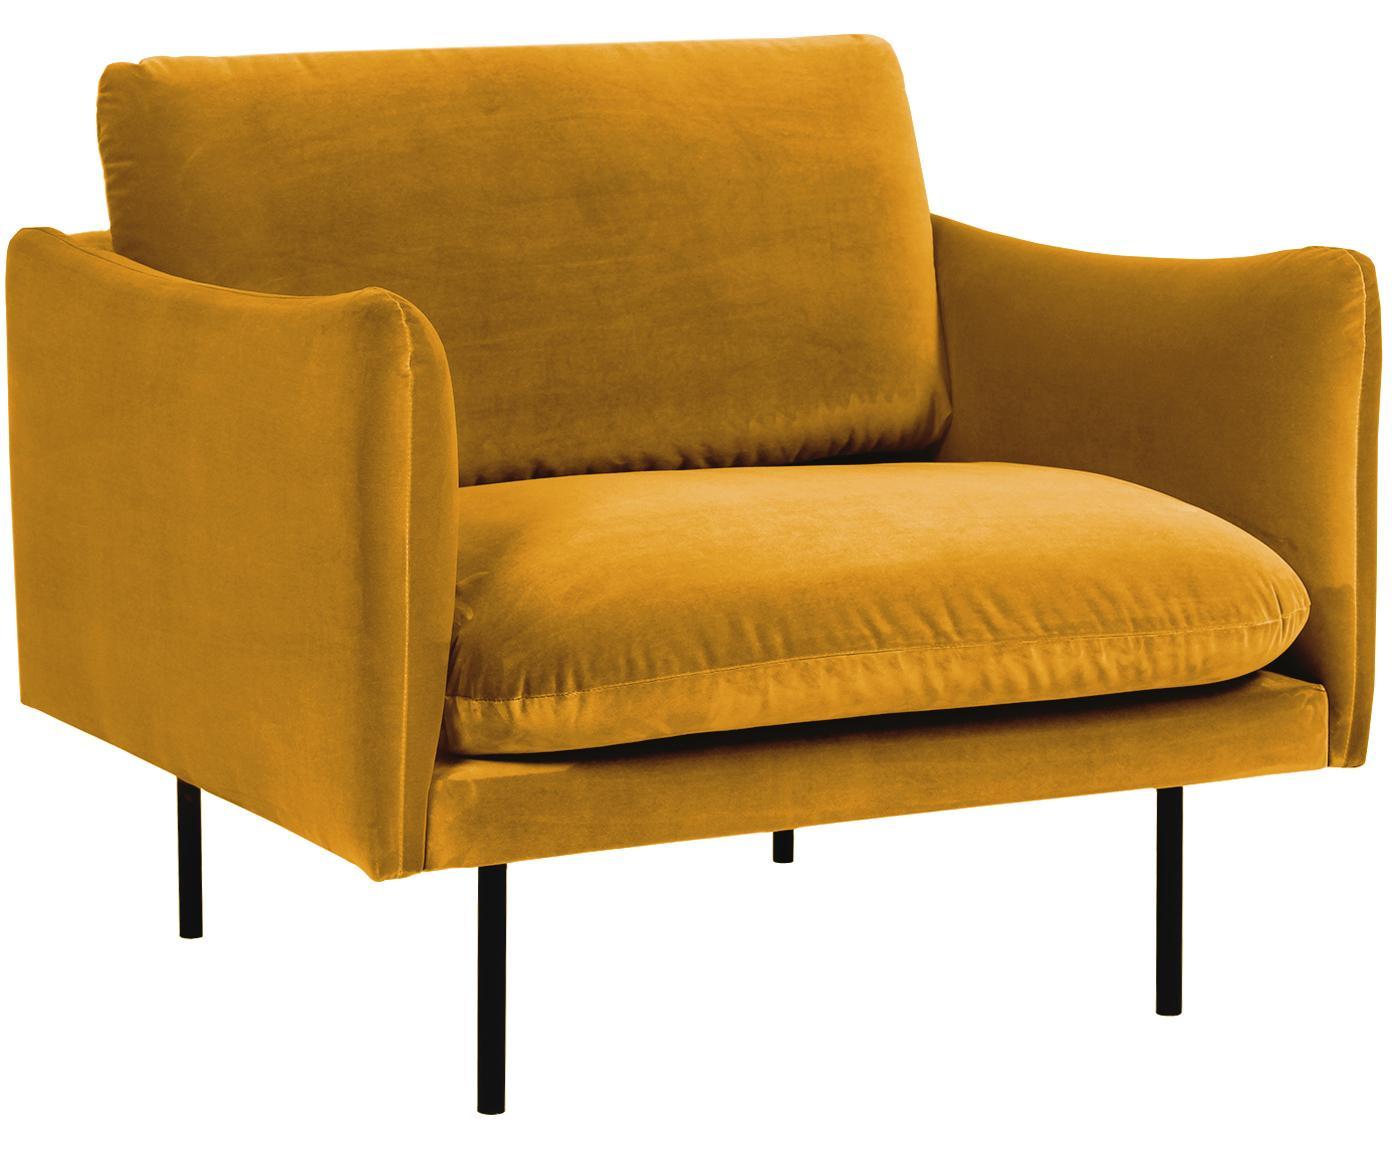 Samt-Sessel Moby, Bezug: Samt (Hochwertiger Polyes, Gestell: Massives Kiefernholz, Samt Senfgelb, B 90 x T 90 cm